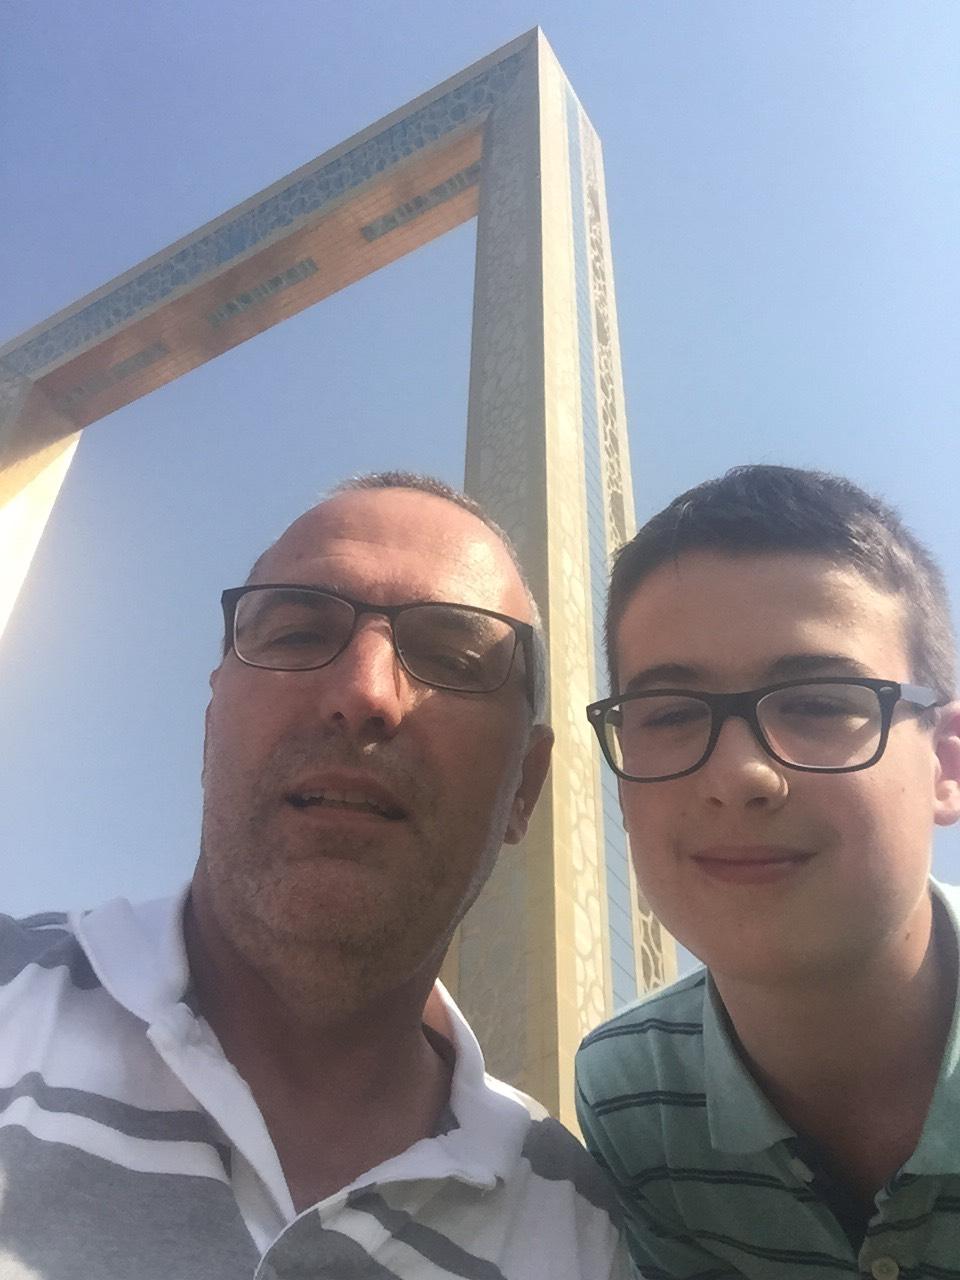 Budai Marci és Feri 2019 június - selfie Dubai kereténél